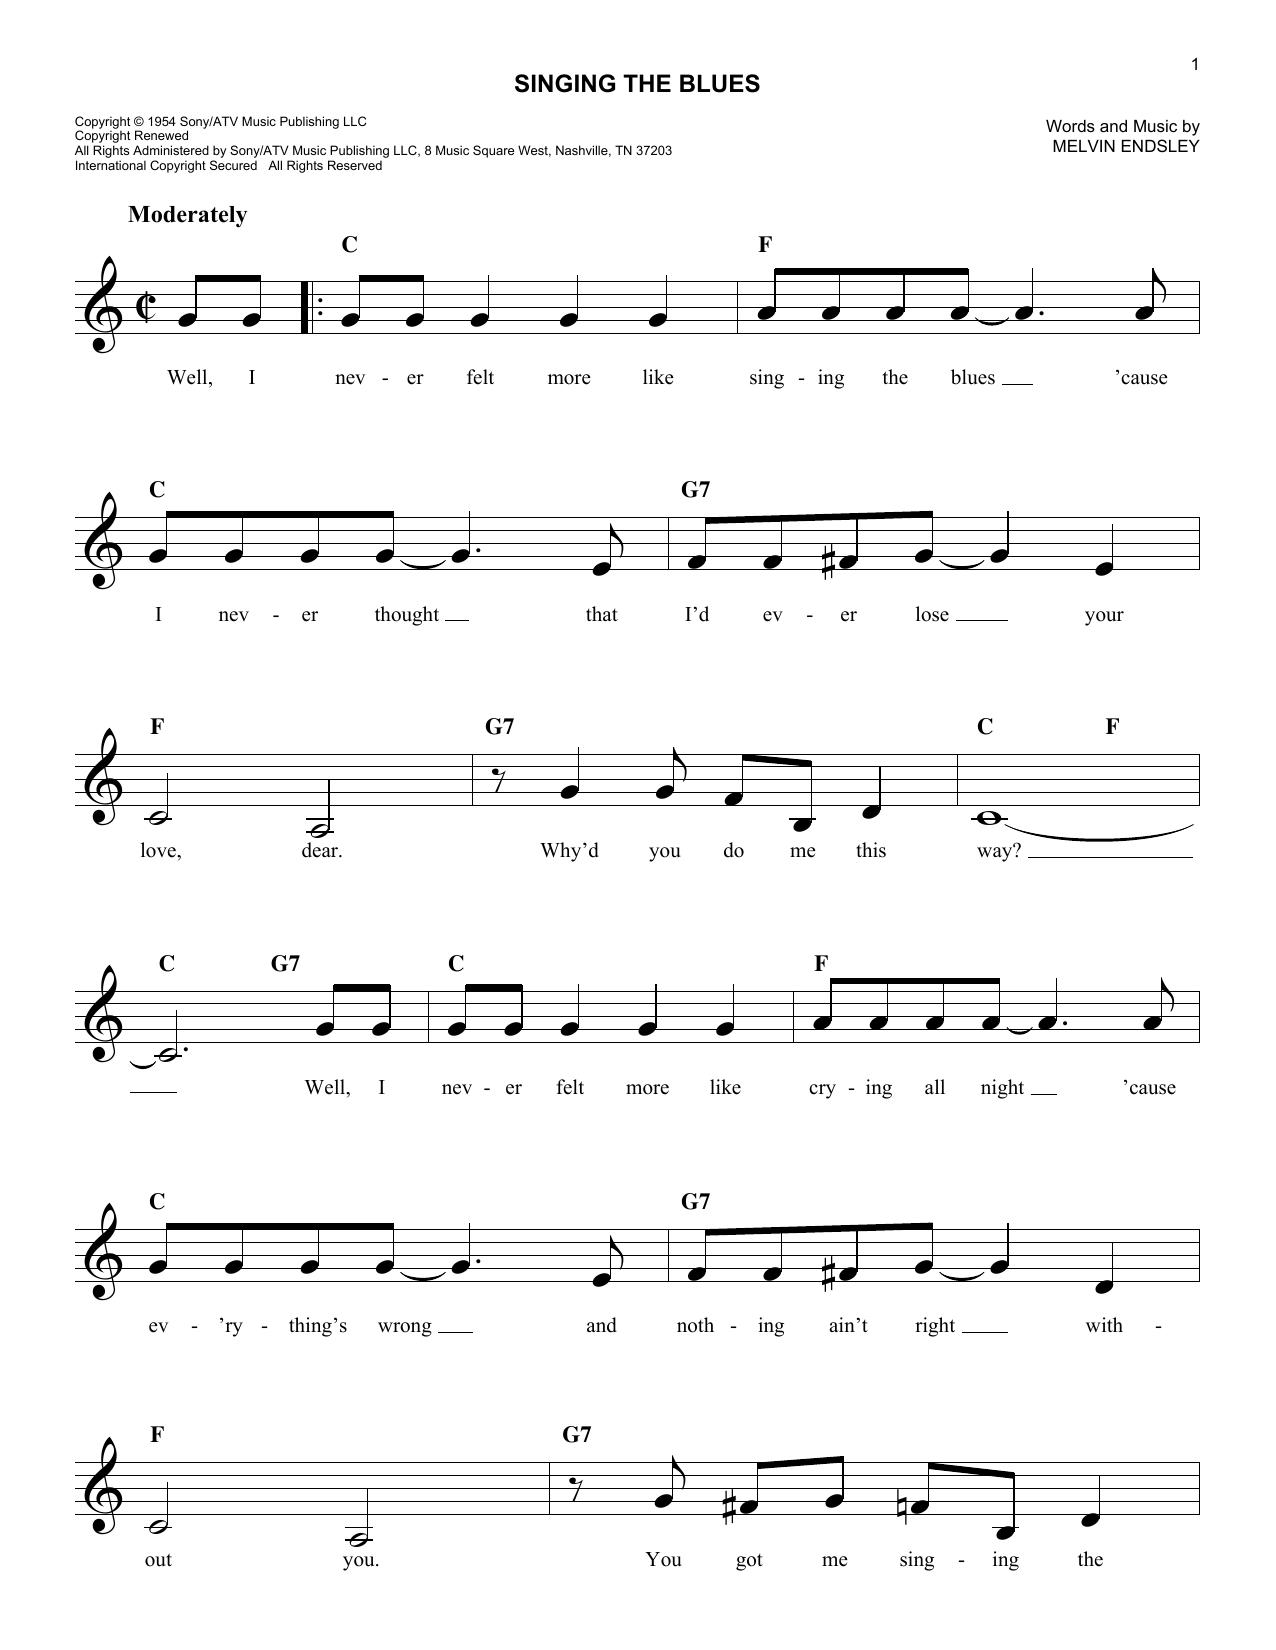 Sheet Music Digital Files To Print Licensed Marty Robbins Digital